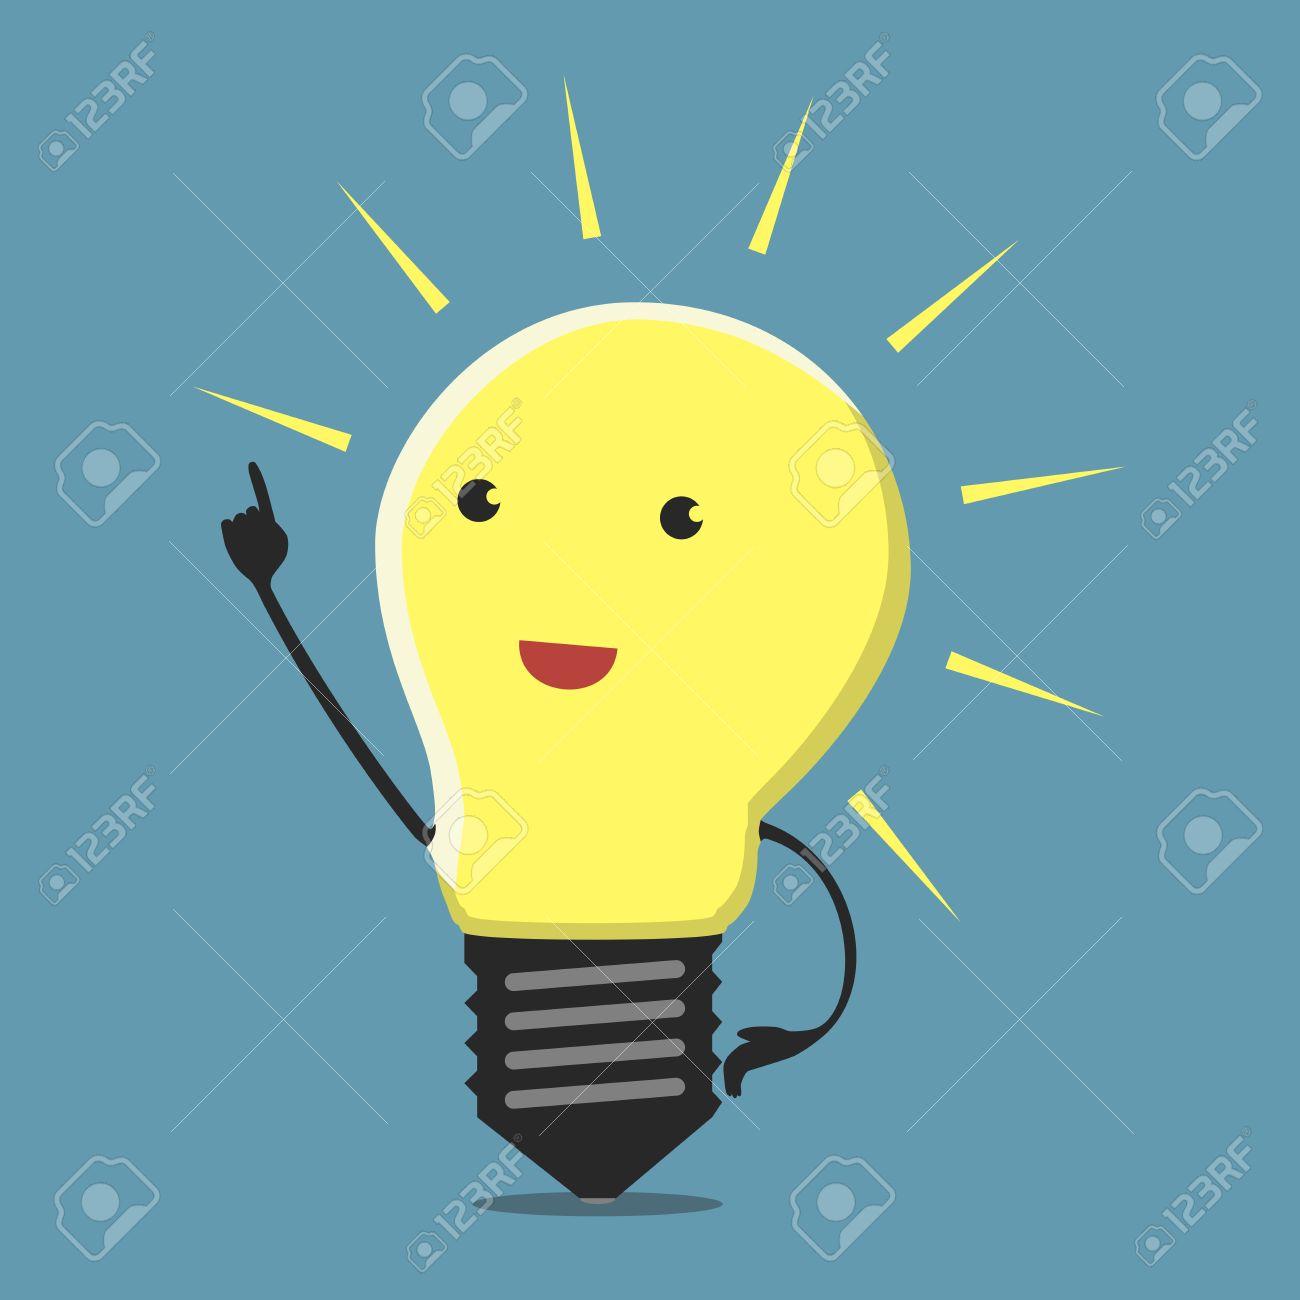 Inspired light bulb character, aha moment - 38478901